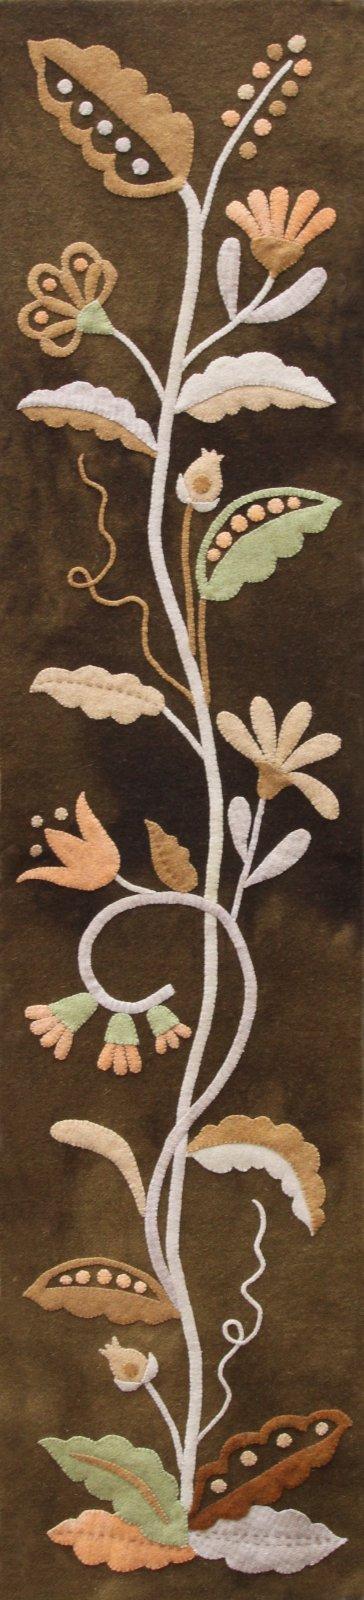 Botanical Pattern by Maggie Bonanomi